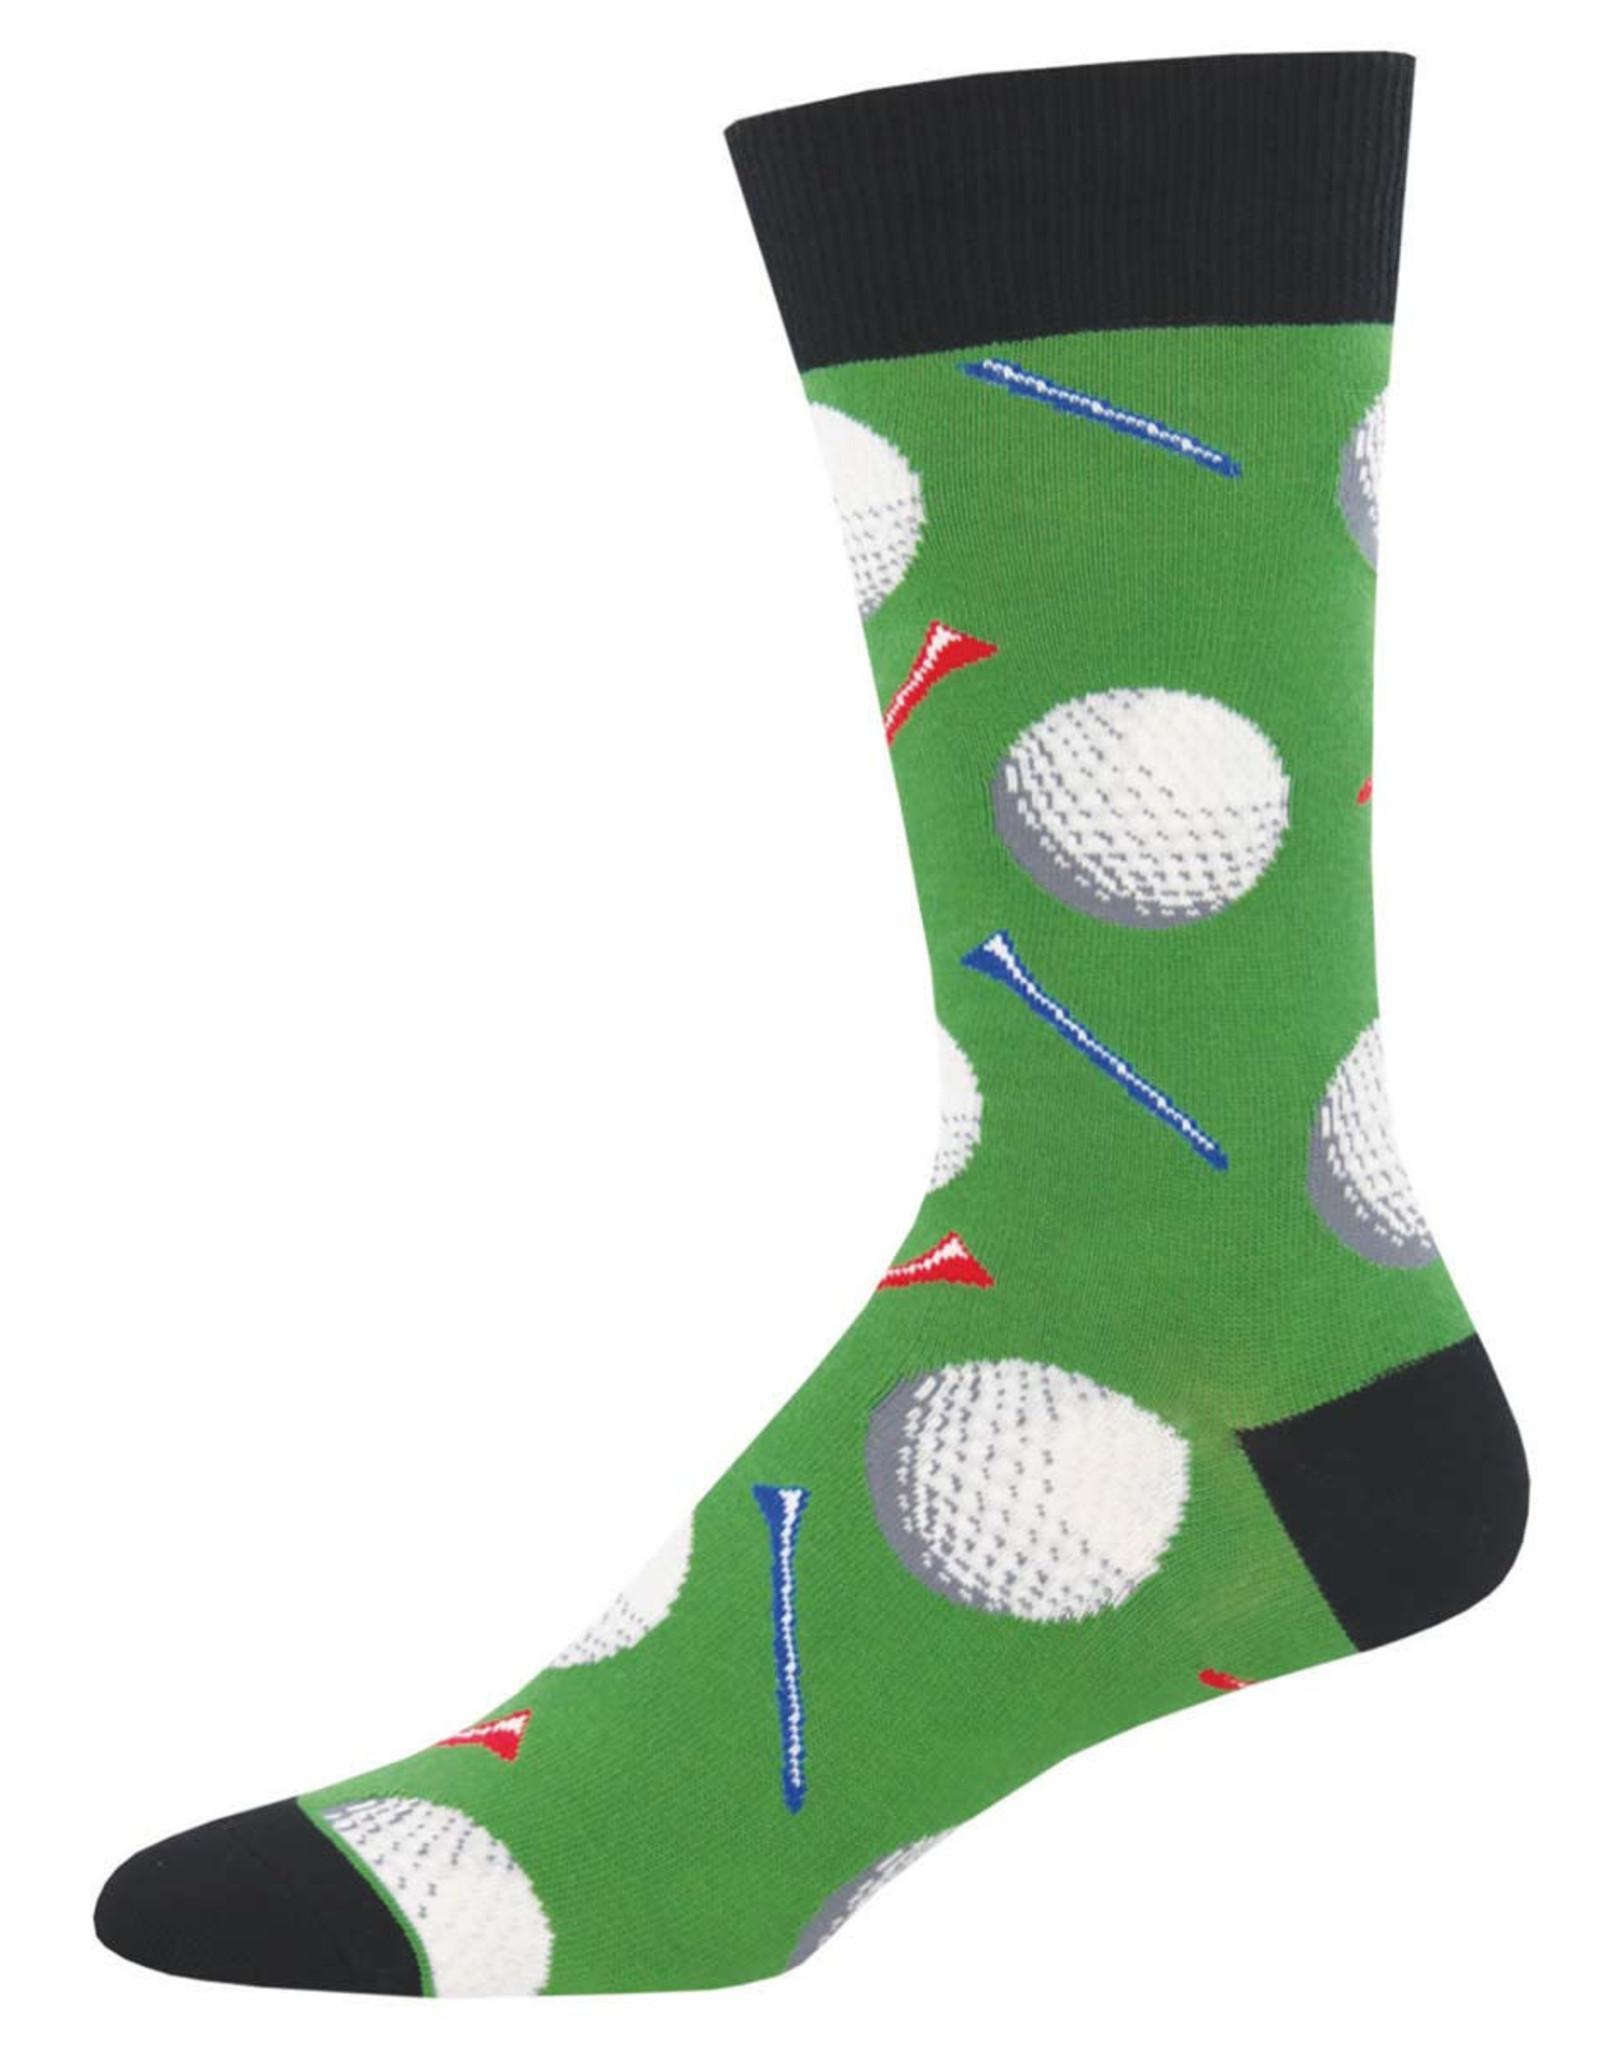 Socksmith Men's Tee It Up Golf Socks